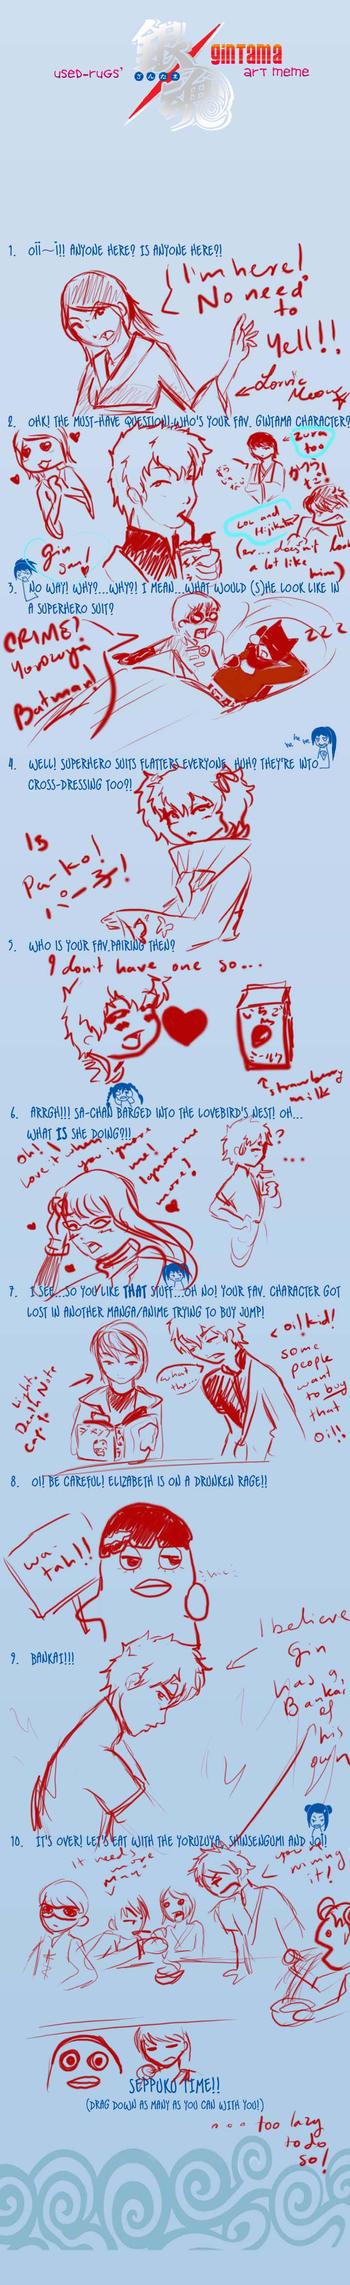 Gintama art meme by LorvicMeow